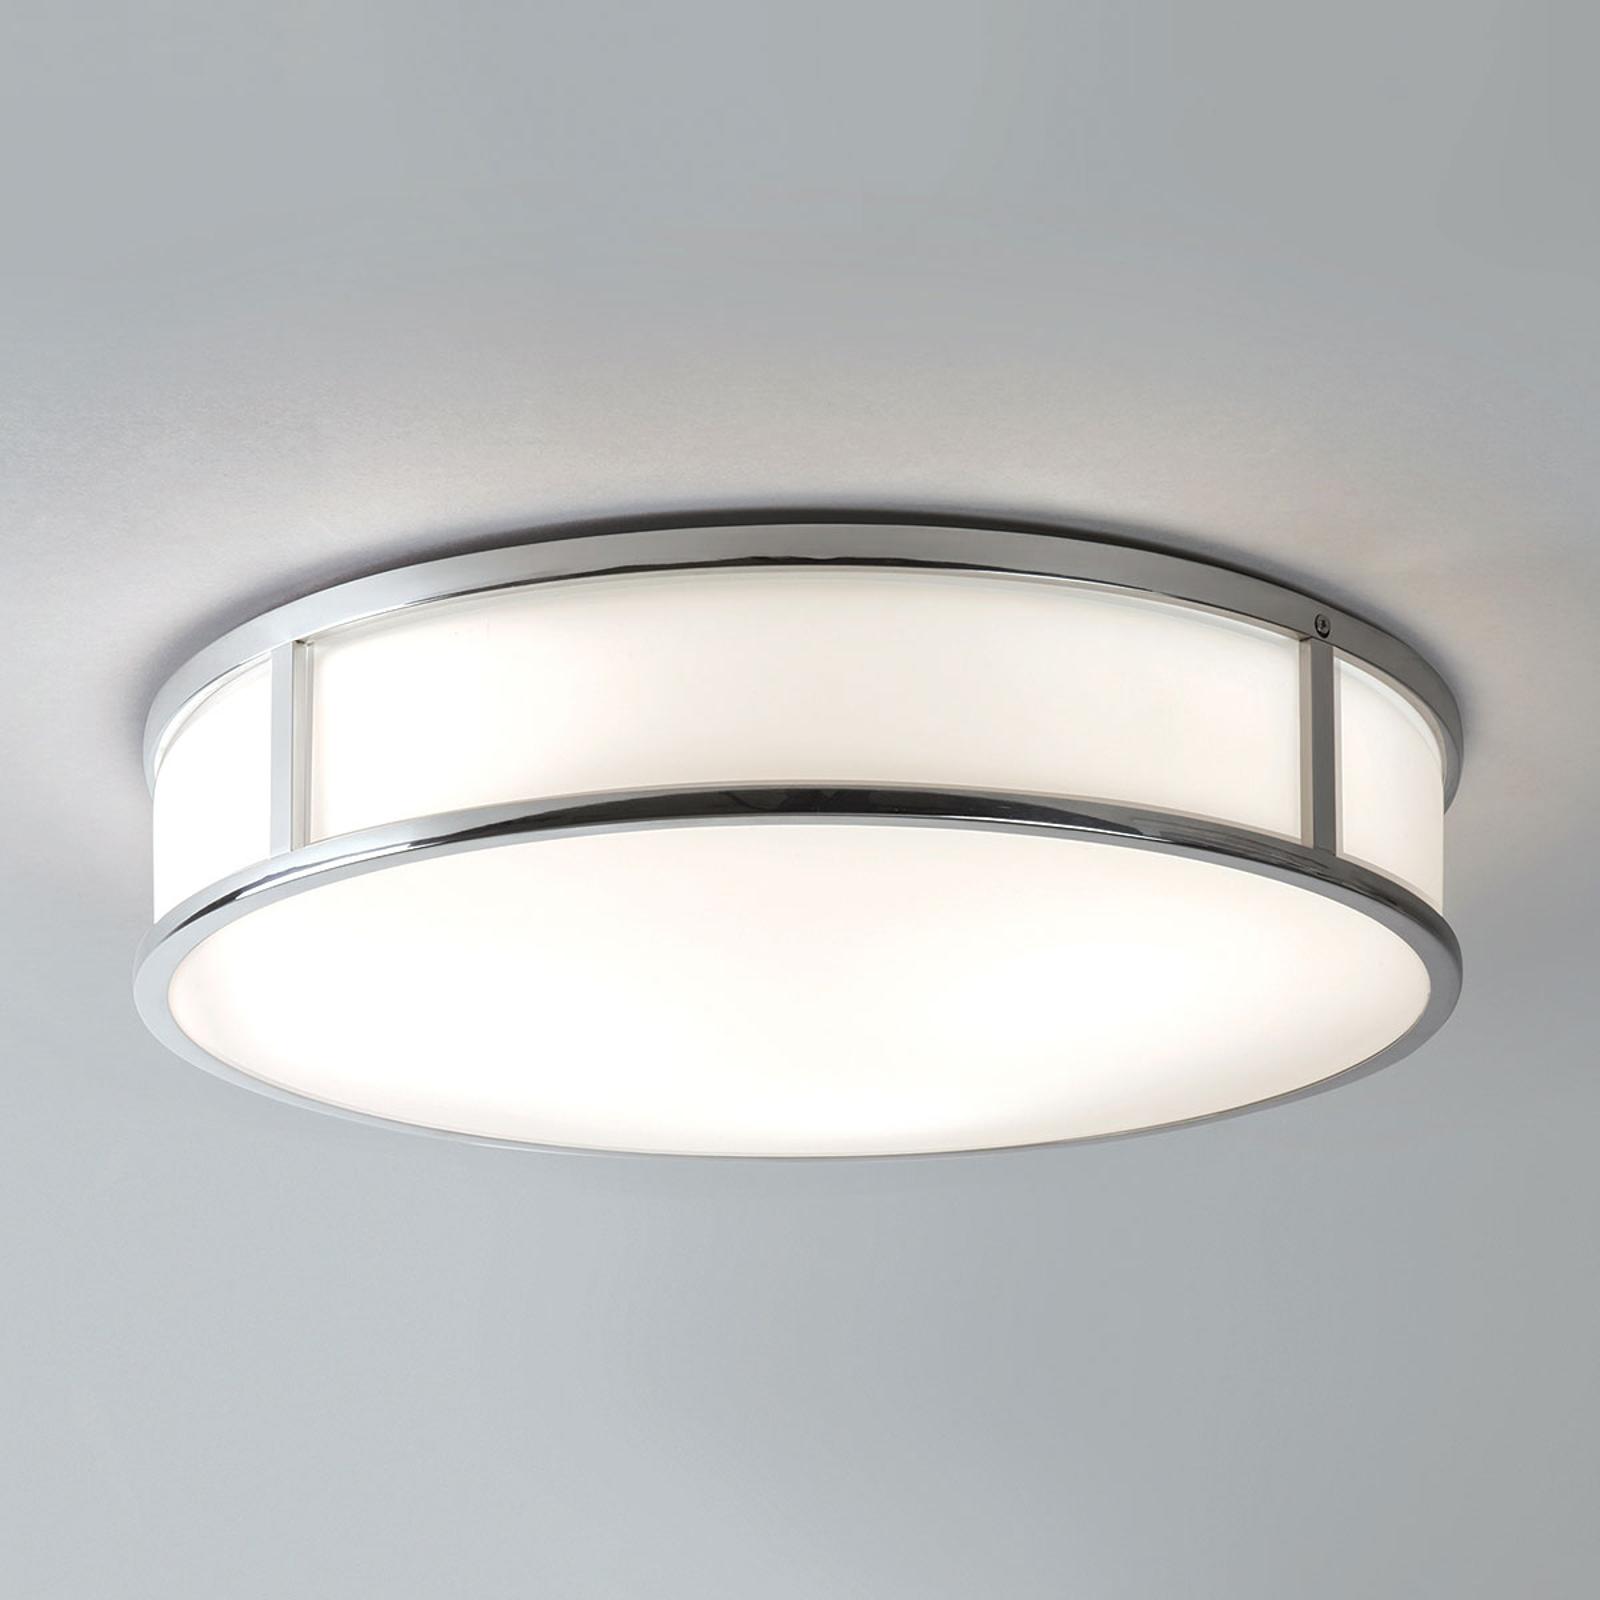 Astro Mashiko Round – lampa sufitowa Ø 40cm chrom